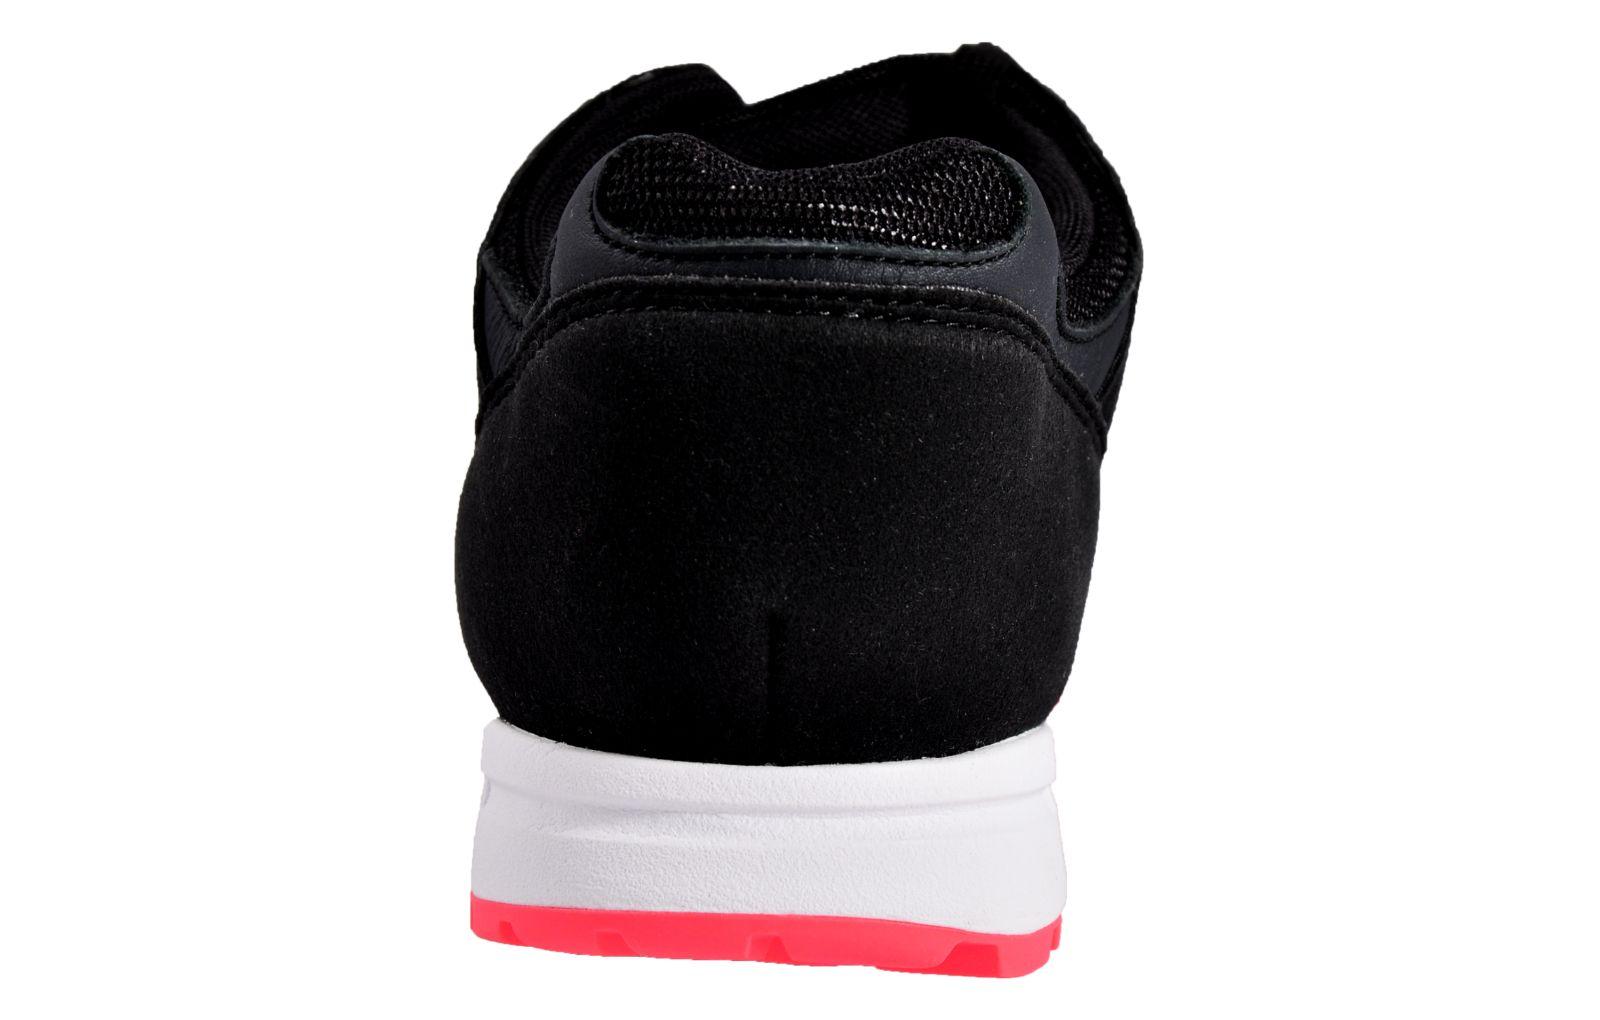 Adidas Originals Equipment Racing 91 Womens Girls